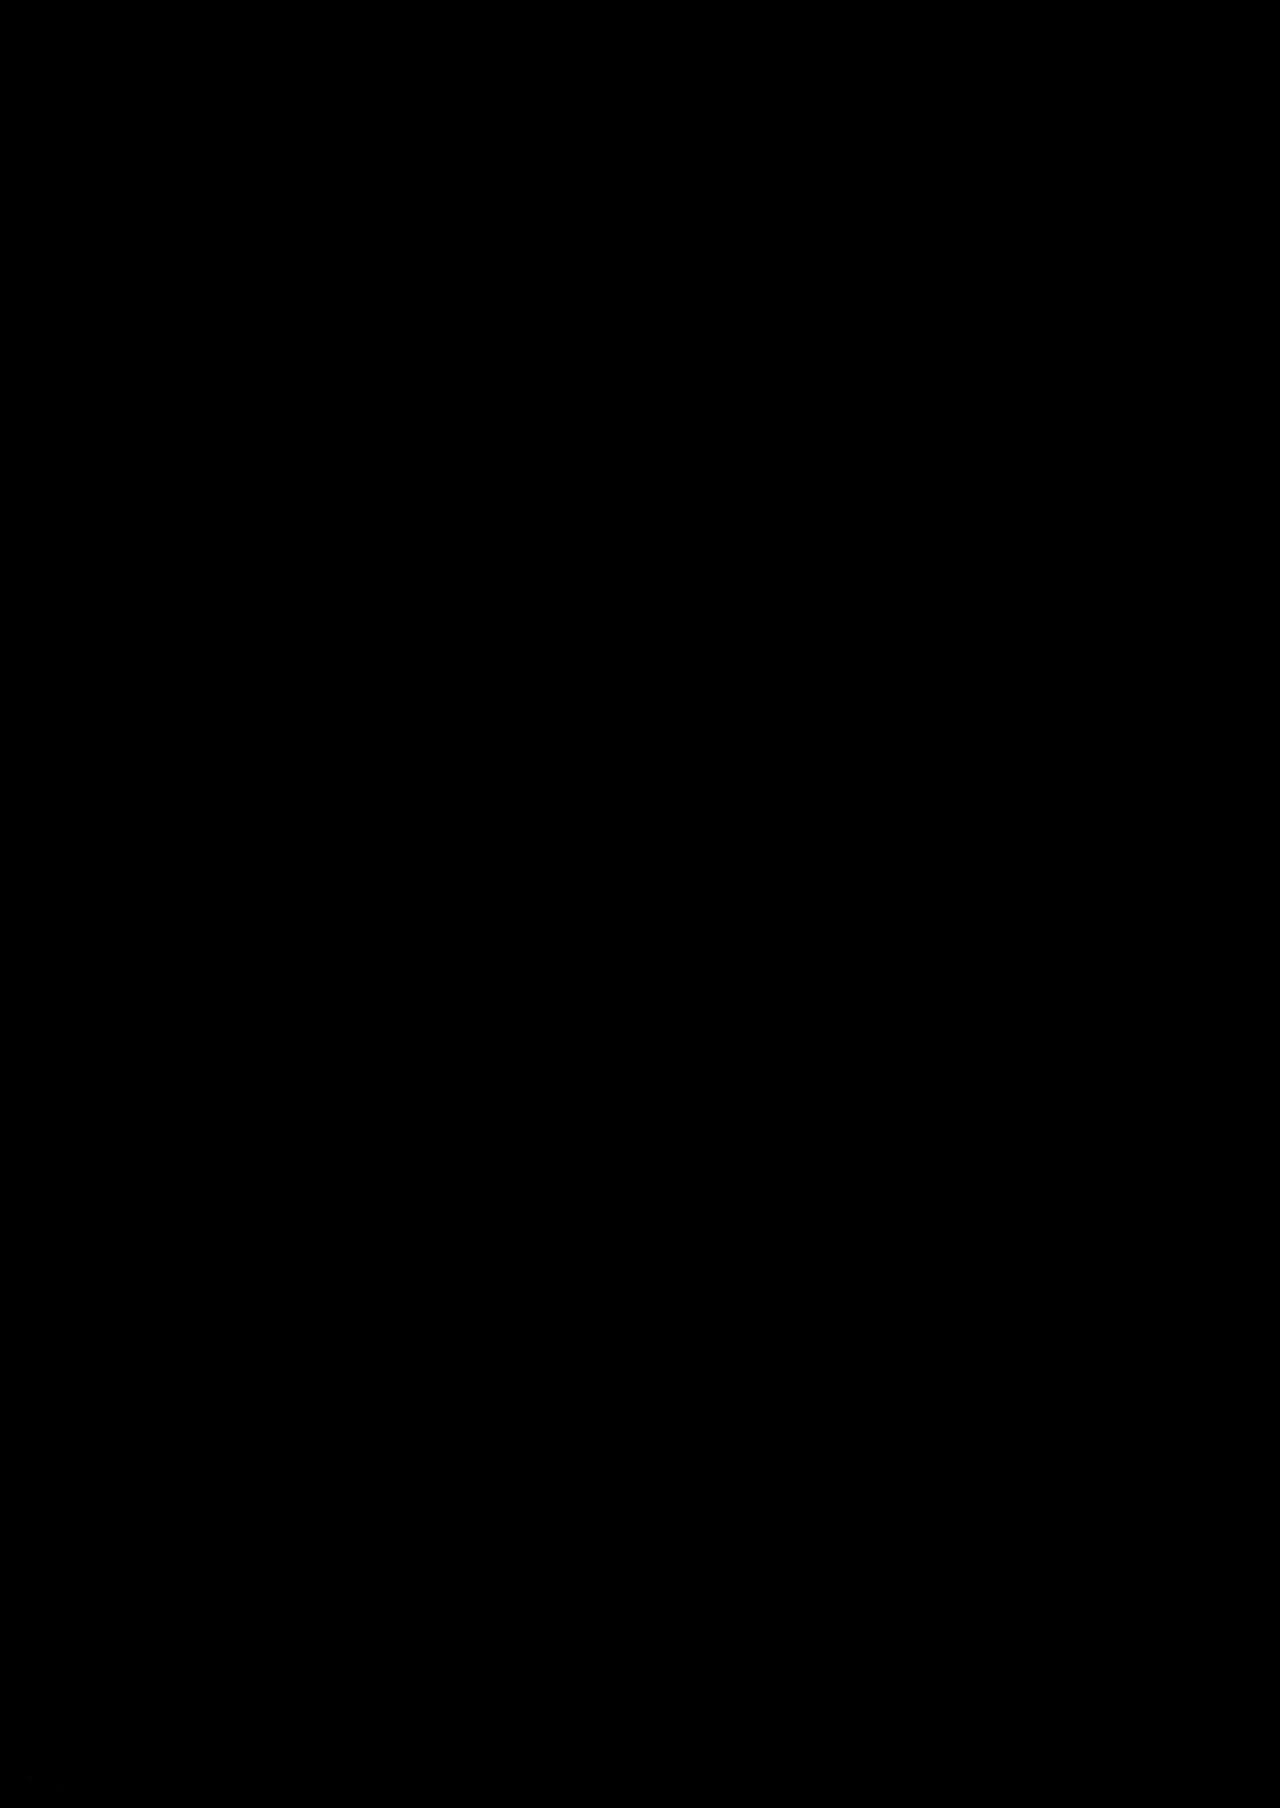 Eromazun (Ma-kurou)] Mesu Ochi Jou Muzan-sama - RAPE OF DEMON SLAYER 4 (Kimetsu no Yaiba) [Chinese] [瑞树汉化组&BW重嵌] [Decensored] [Digital] 2